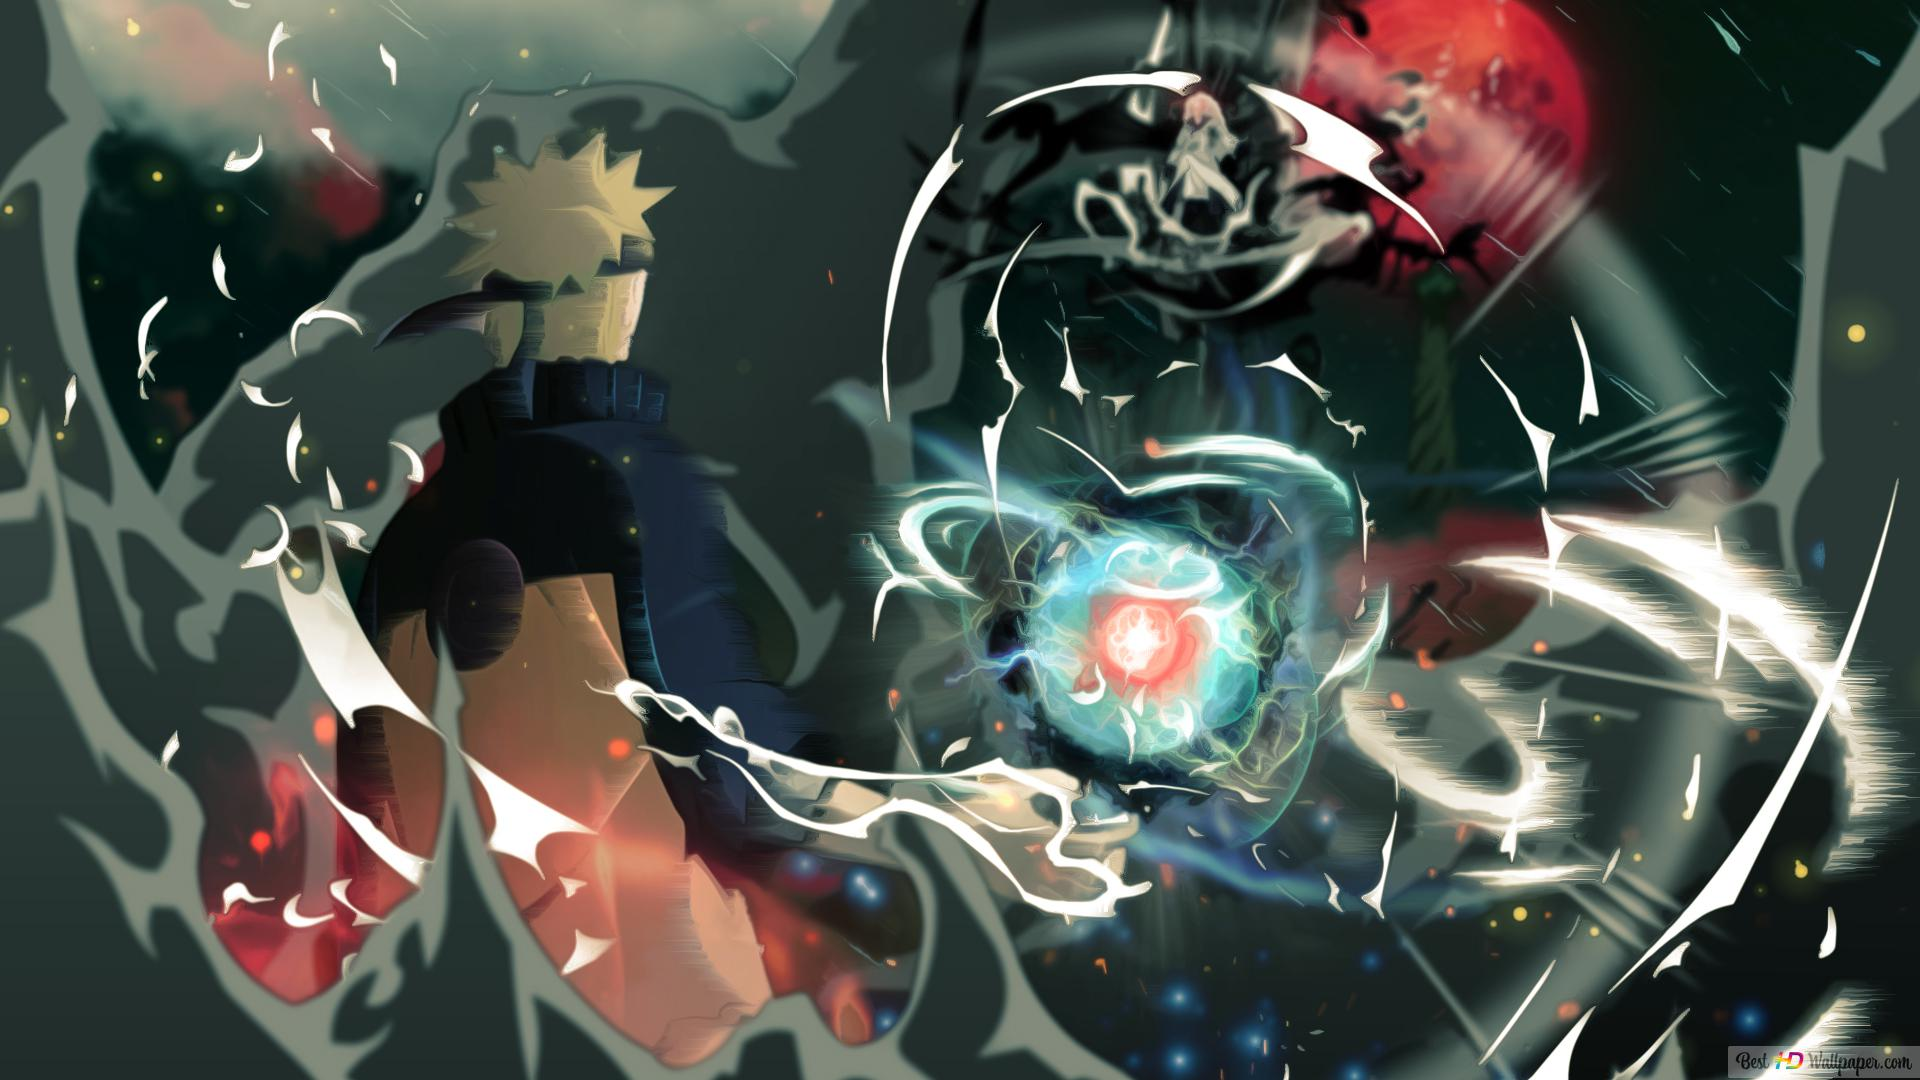 Naruto ナルト 疾風伝 うずまきナルト対マダラサスケ Hd壁紙の